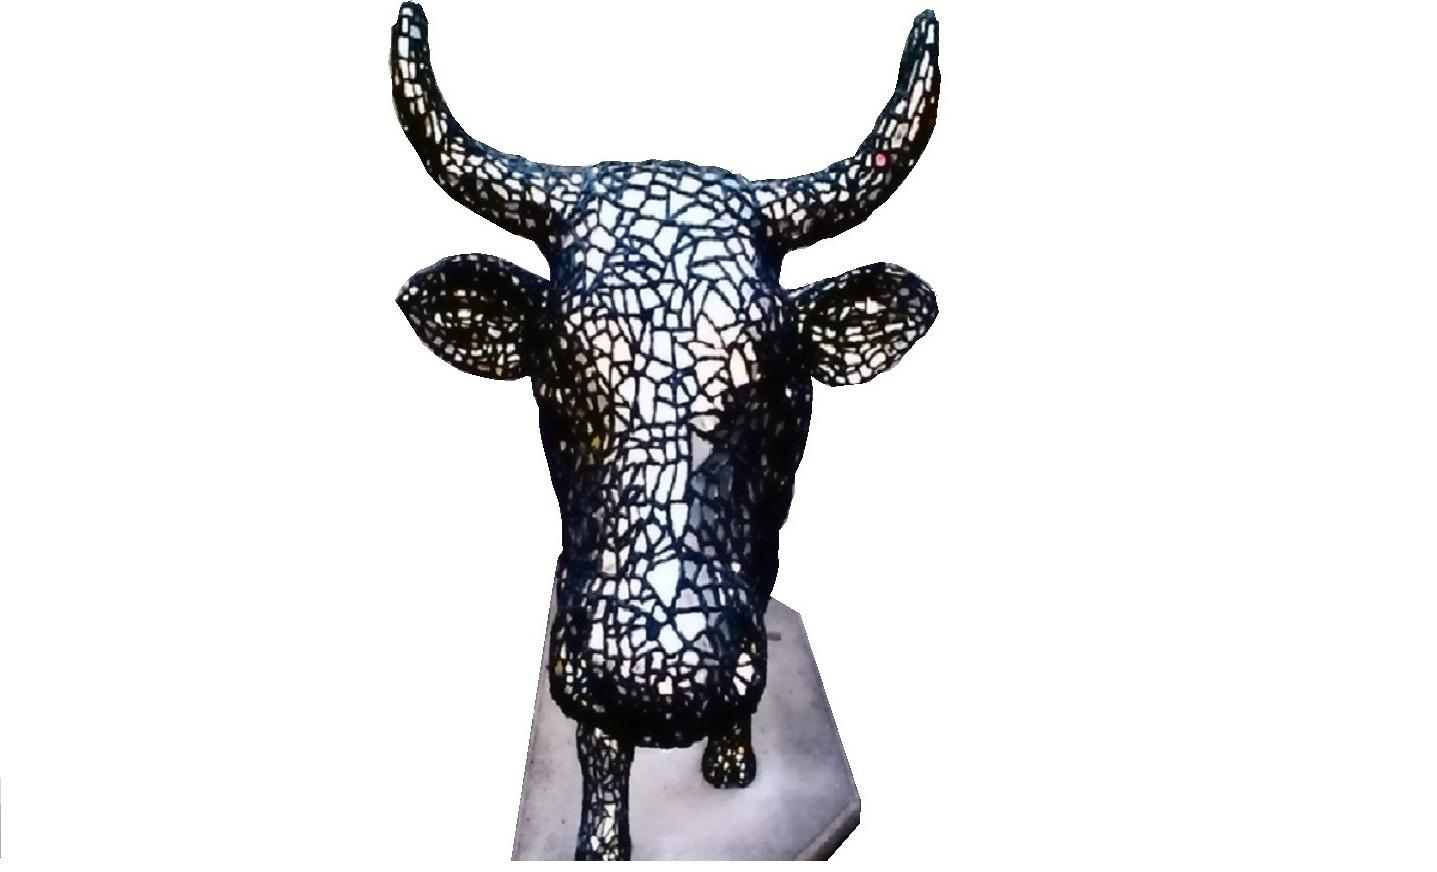 Mirroriam, Cows Parade Chicago 1999